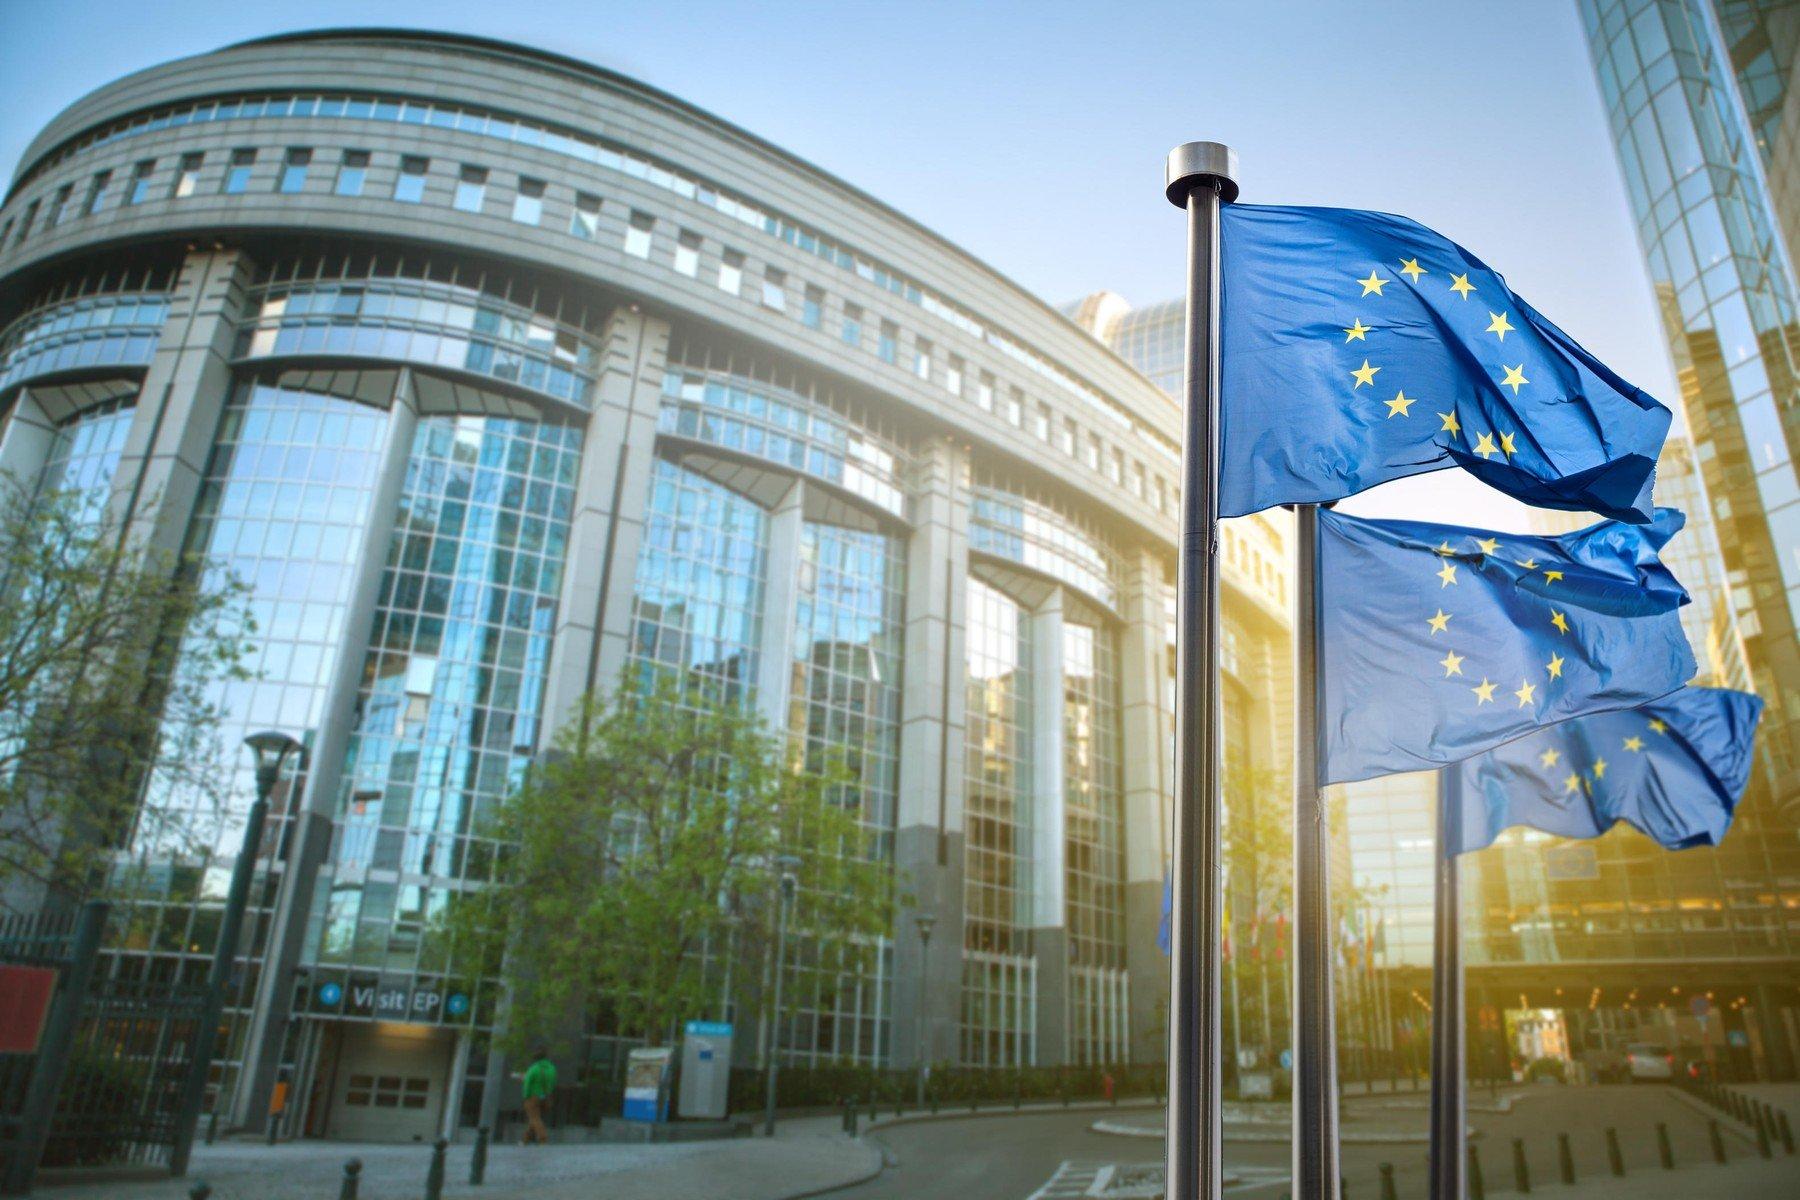 Zgrada Europskog parlamenta u Bruxellesu